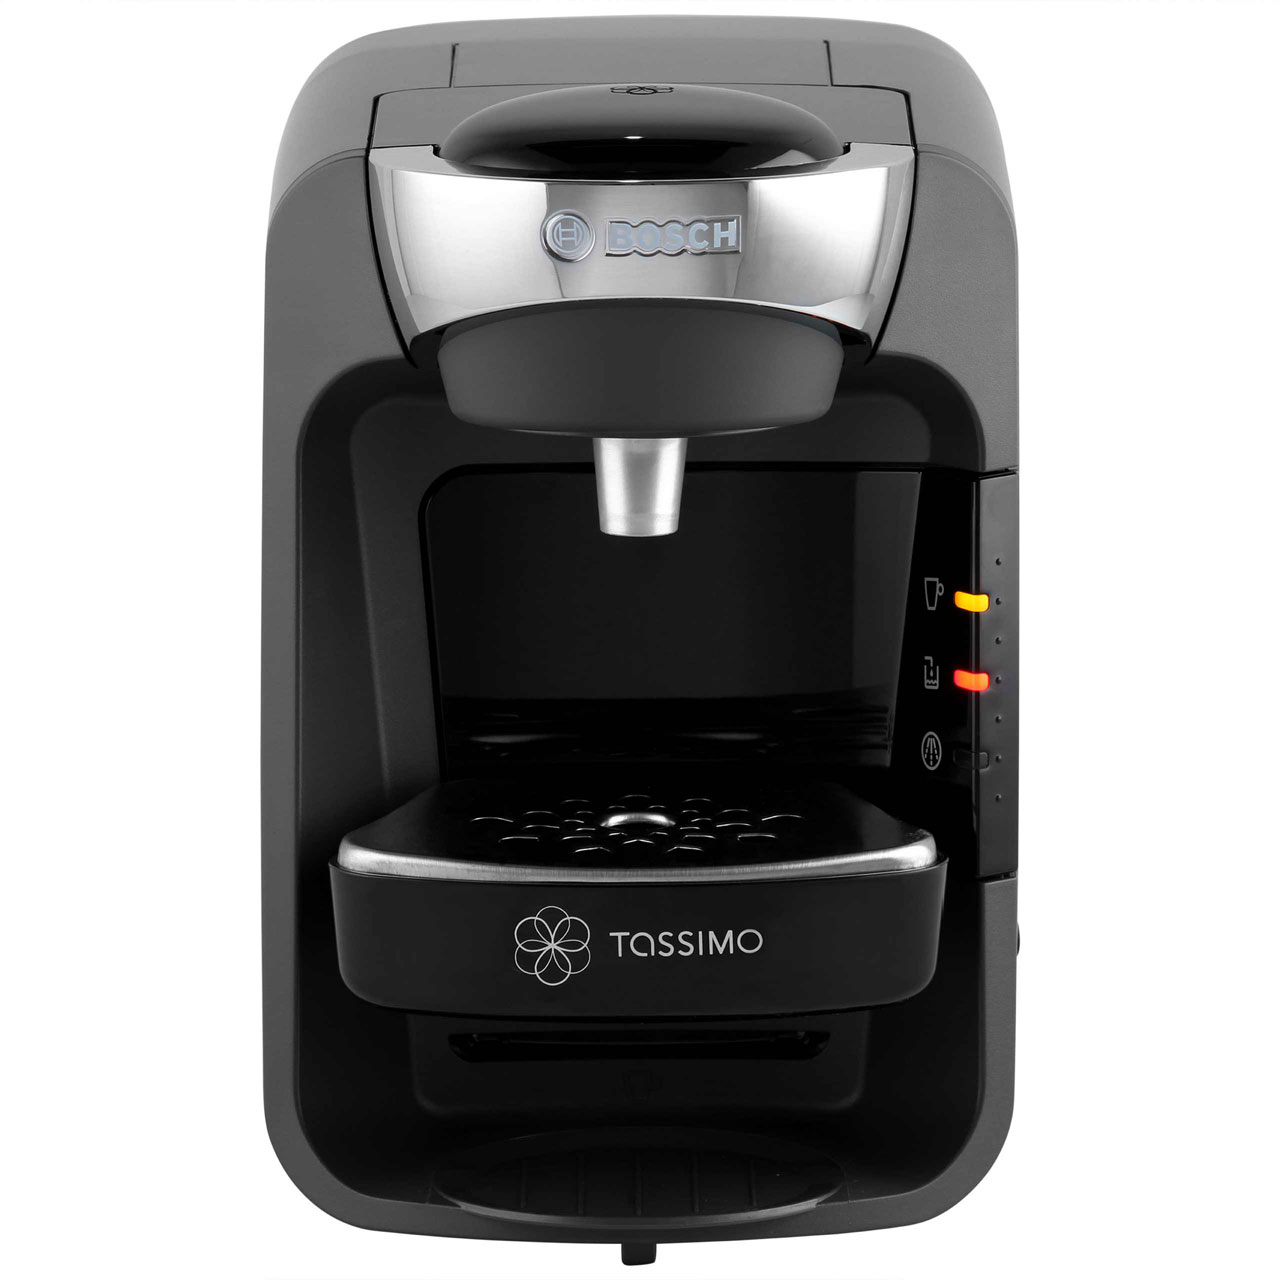 Tassimo by Bosch Suny TAS3202GB Pod Coffee Machine Black